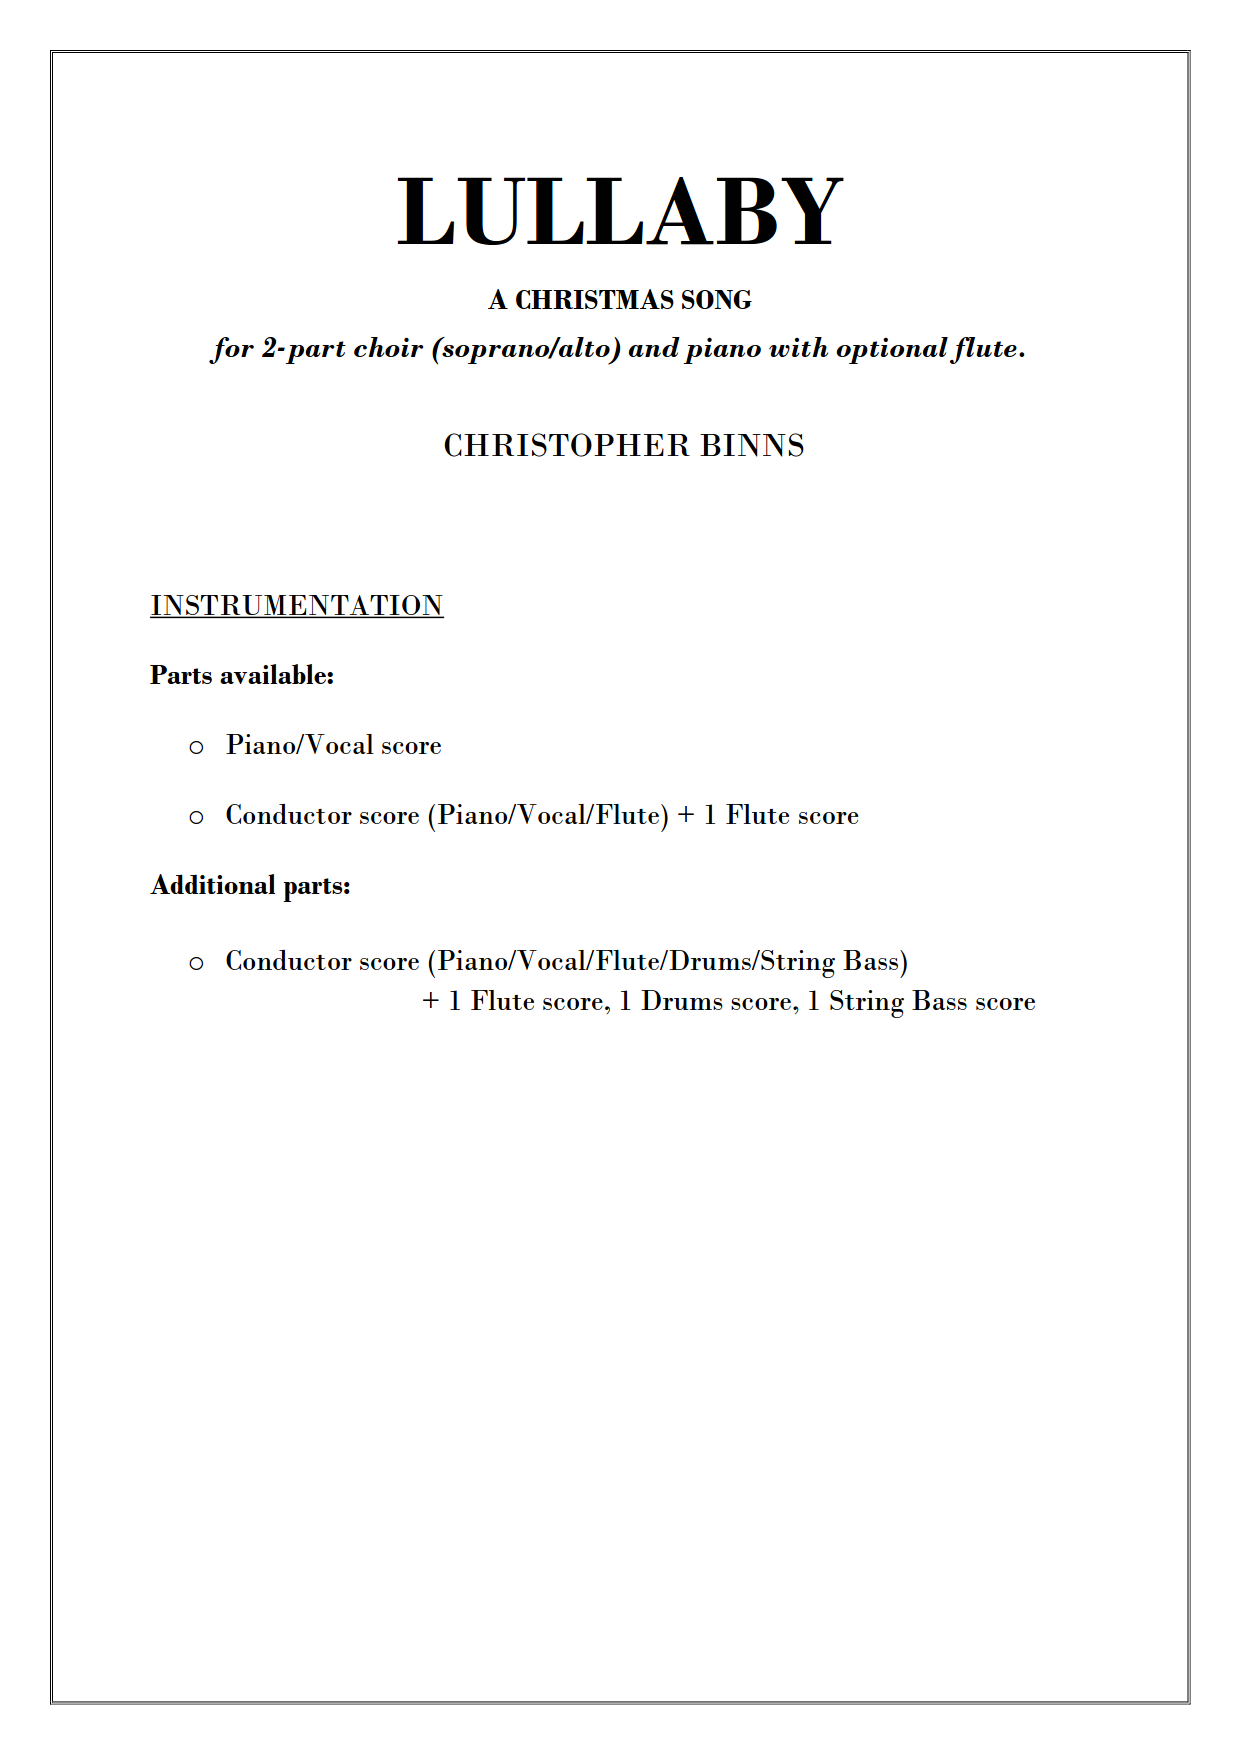 LULLABY - Instrumentation List